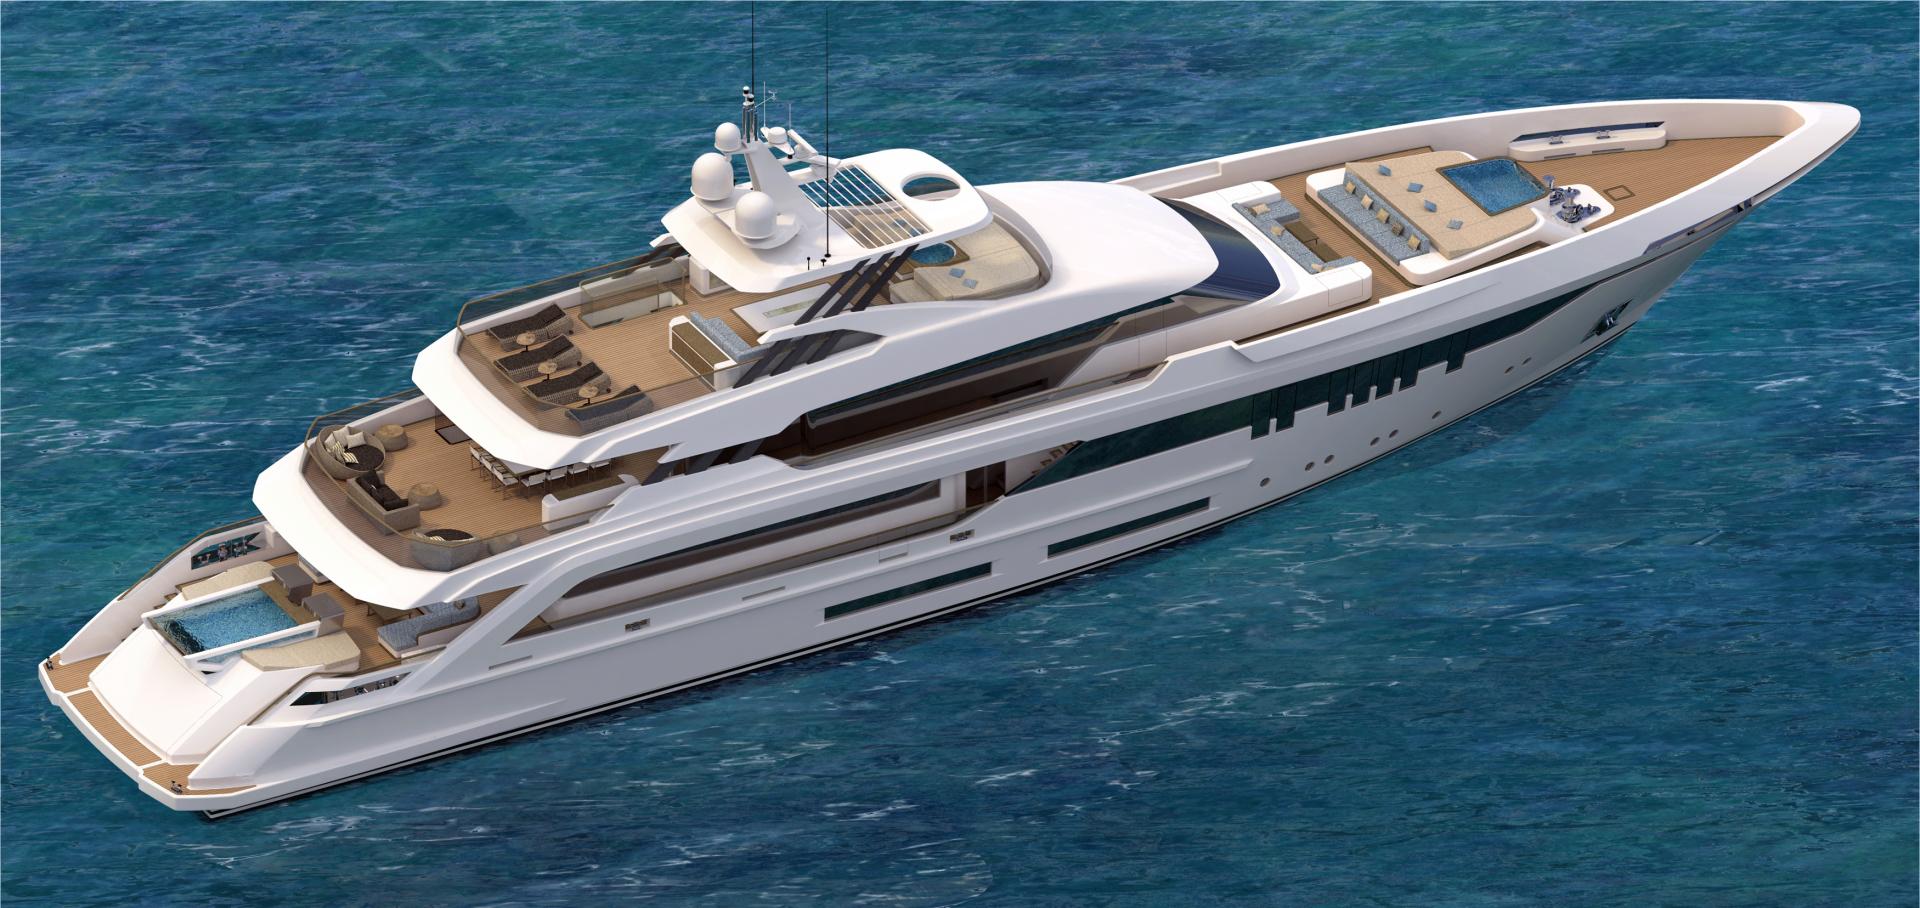 GHI Yachts 2023-THUNDERBIRD 165 Korea, Republic of-1337226 | Thumbnail